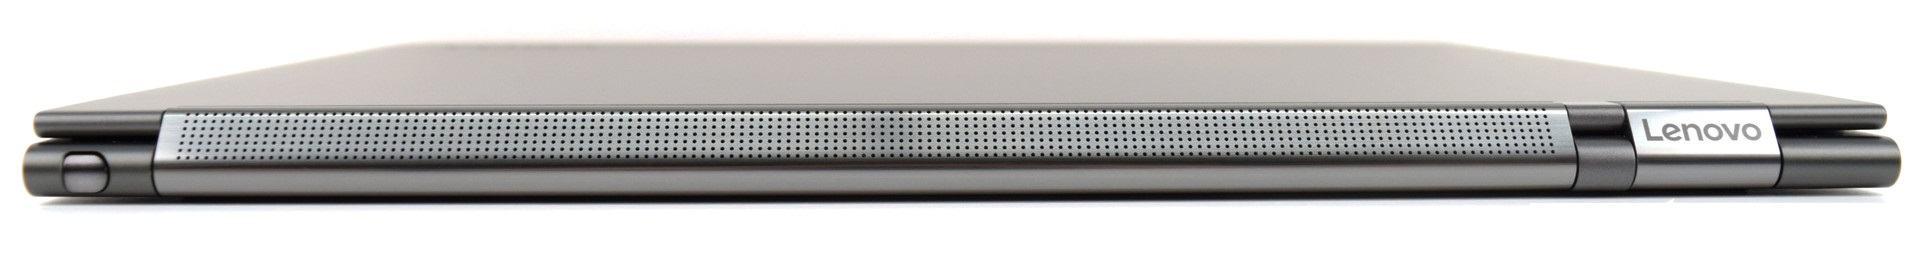 đánh giá Lenovo Yoga C930